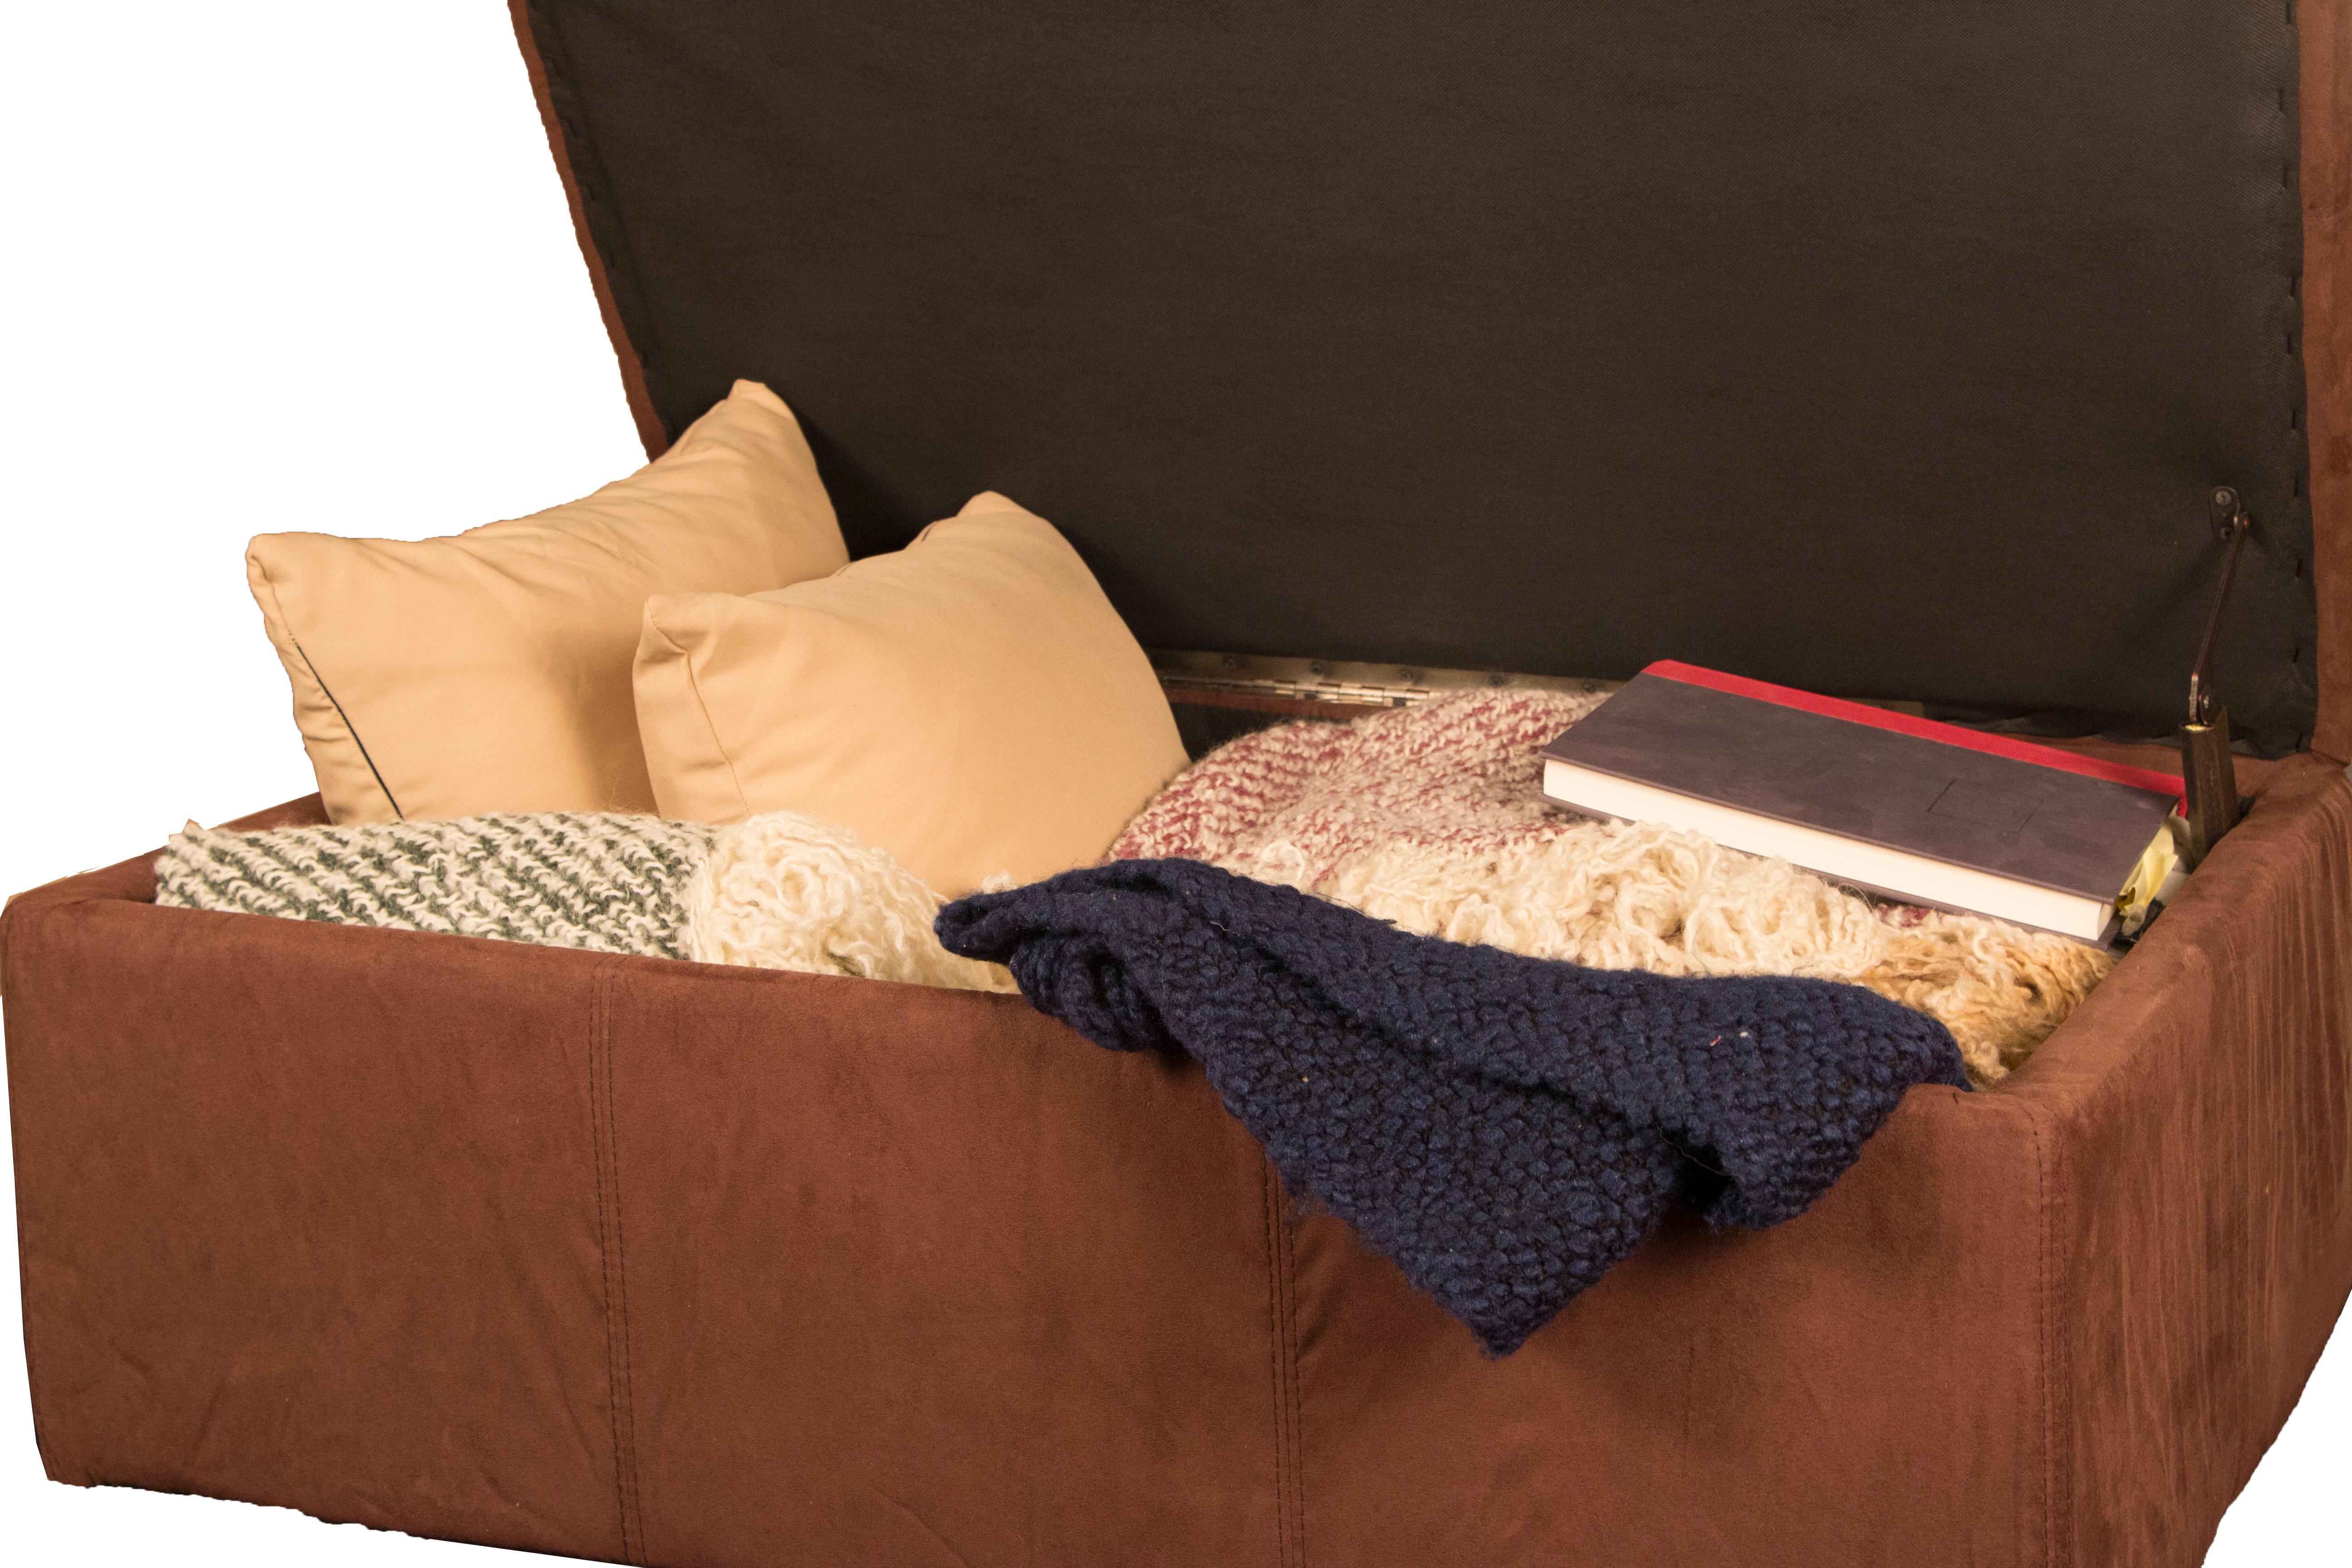 Epic Furnishings Padded Tufted Hinged Storage Ottoman Bench  sc 1 st  Amazon.com & Amazon.com: 24